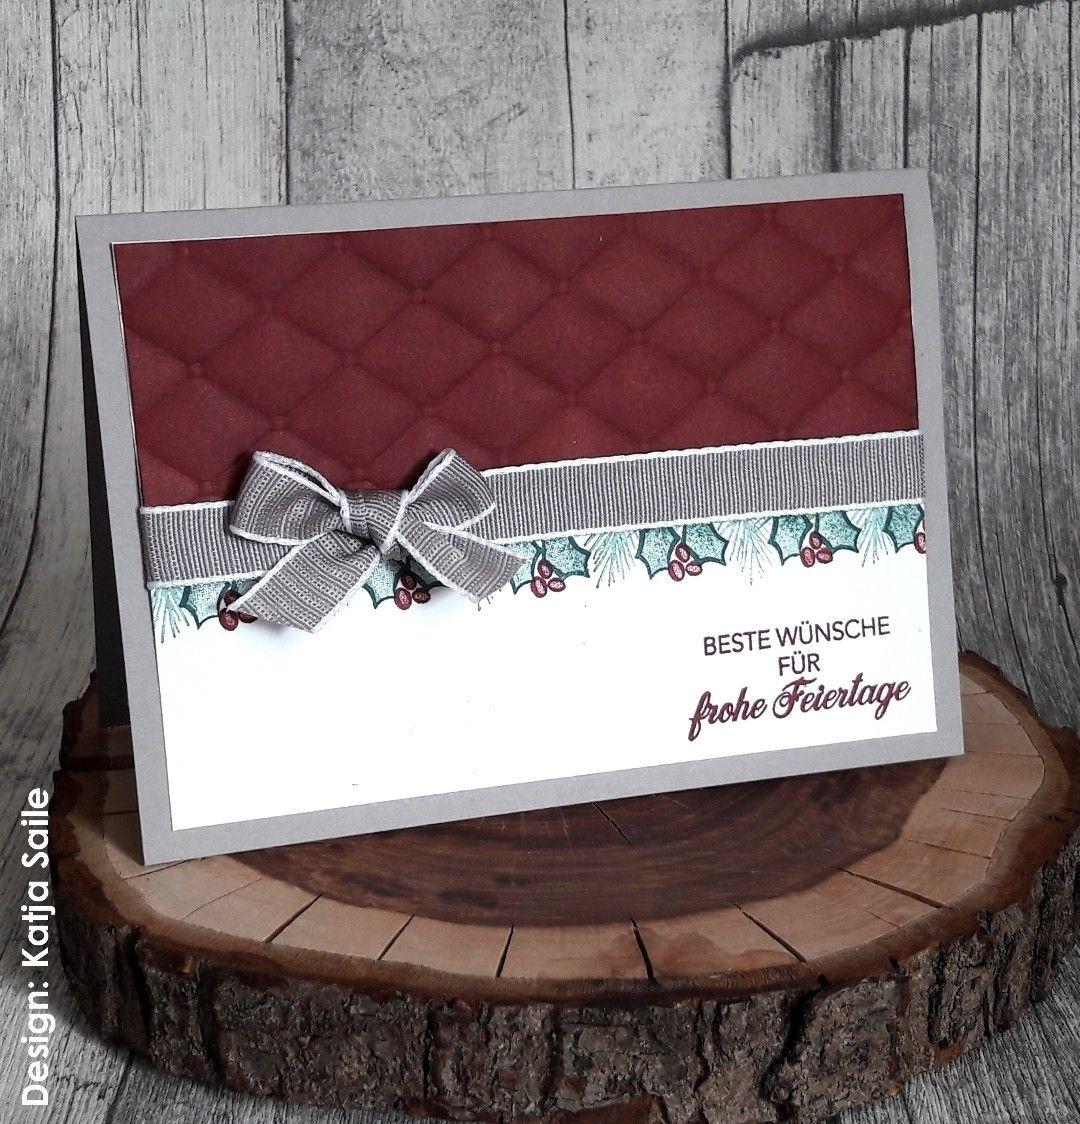 Christmas cards handmade image by Vickie Madewell on